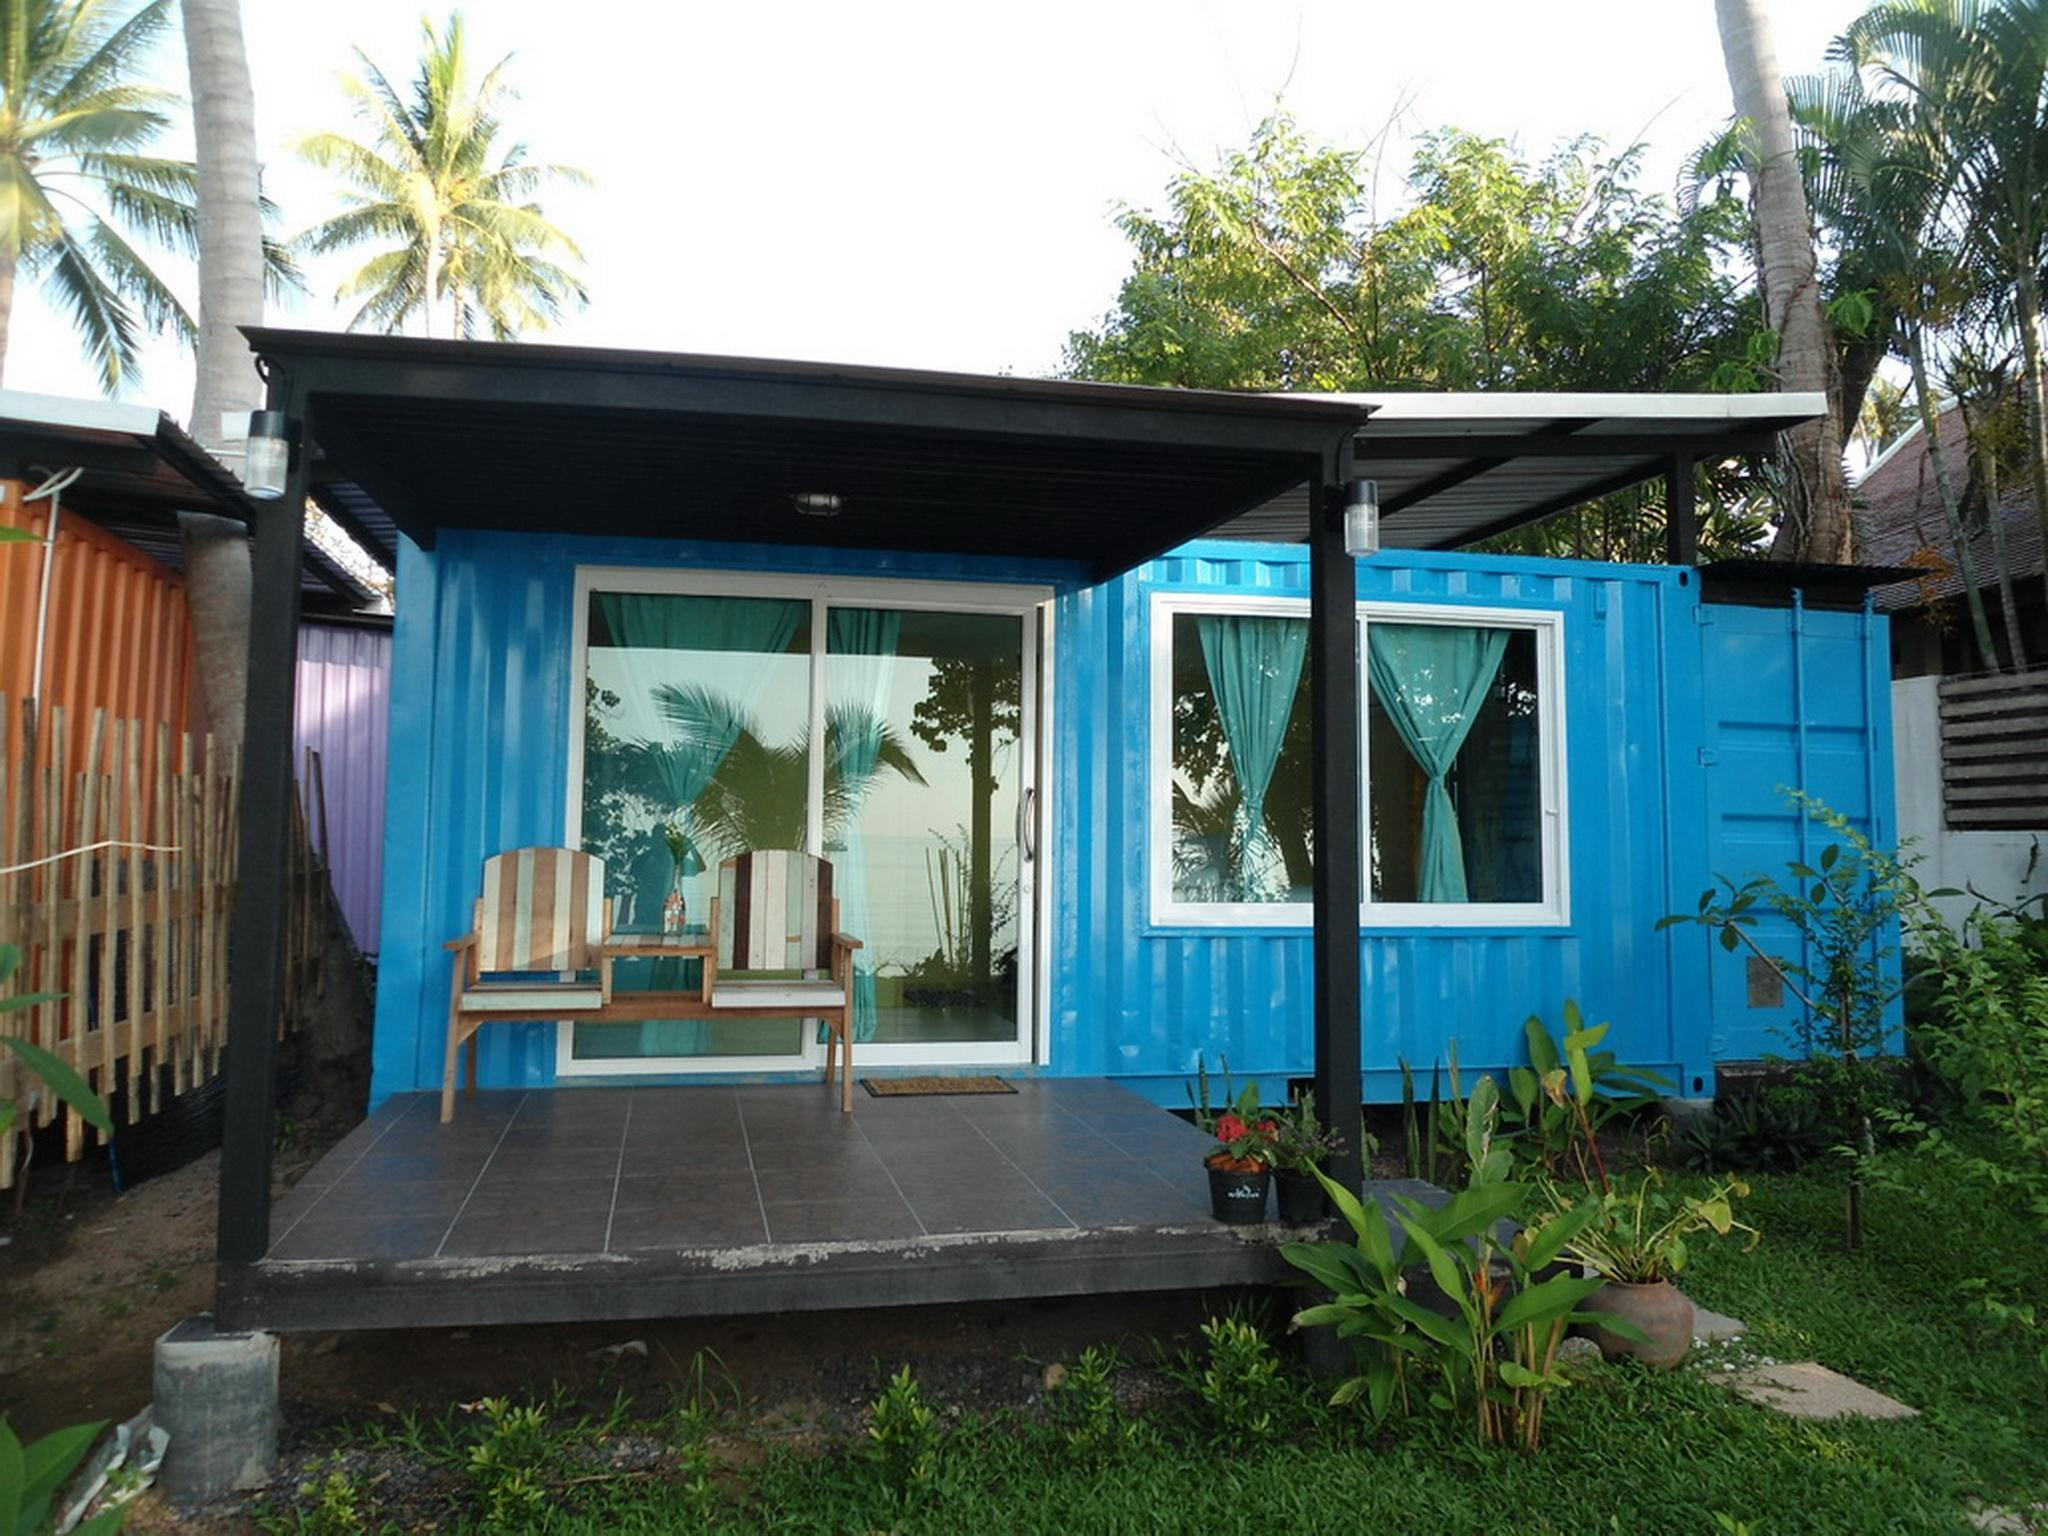 Think & Retro Cafe Lipa Noi Hotel - Koh Samui